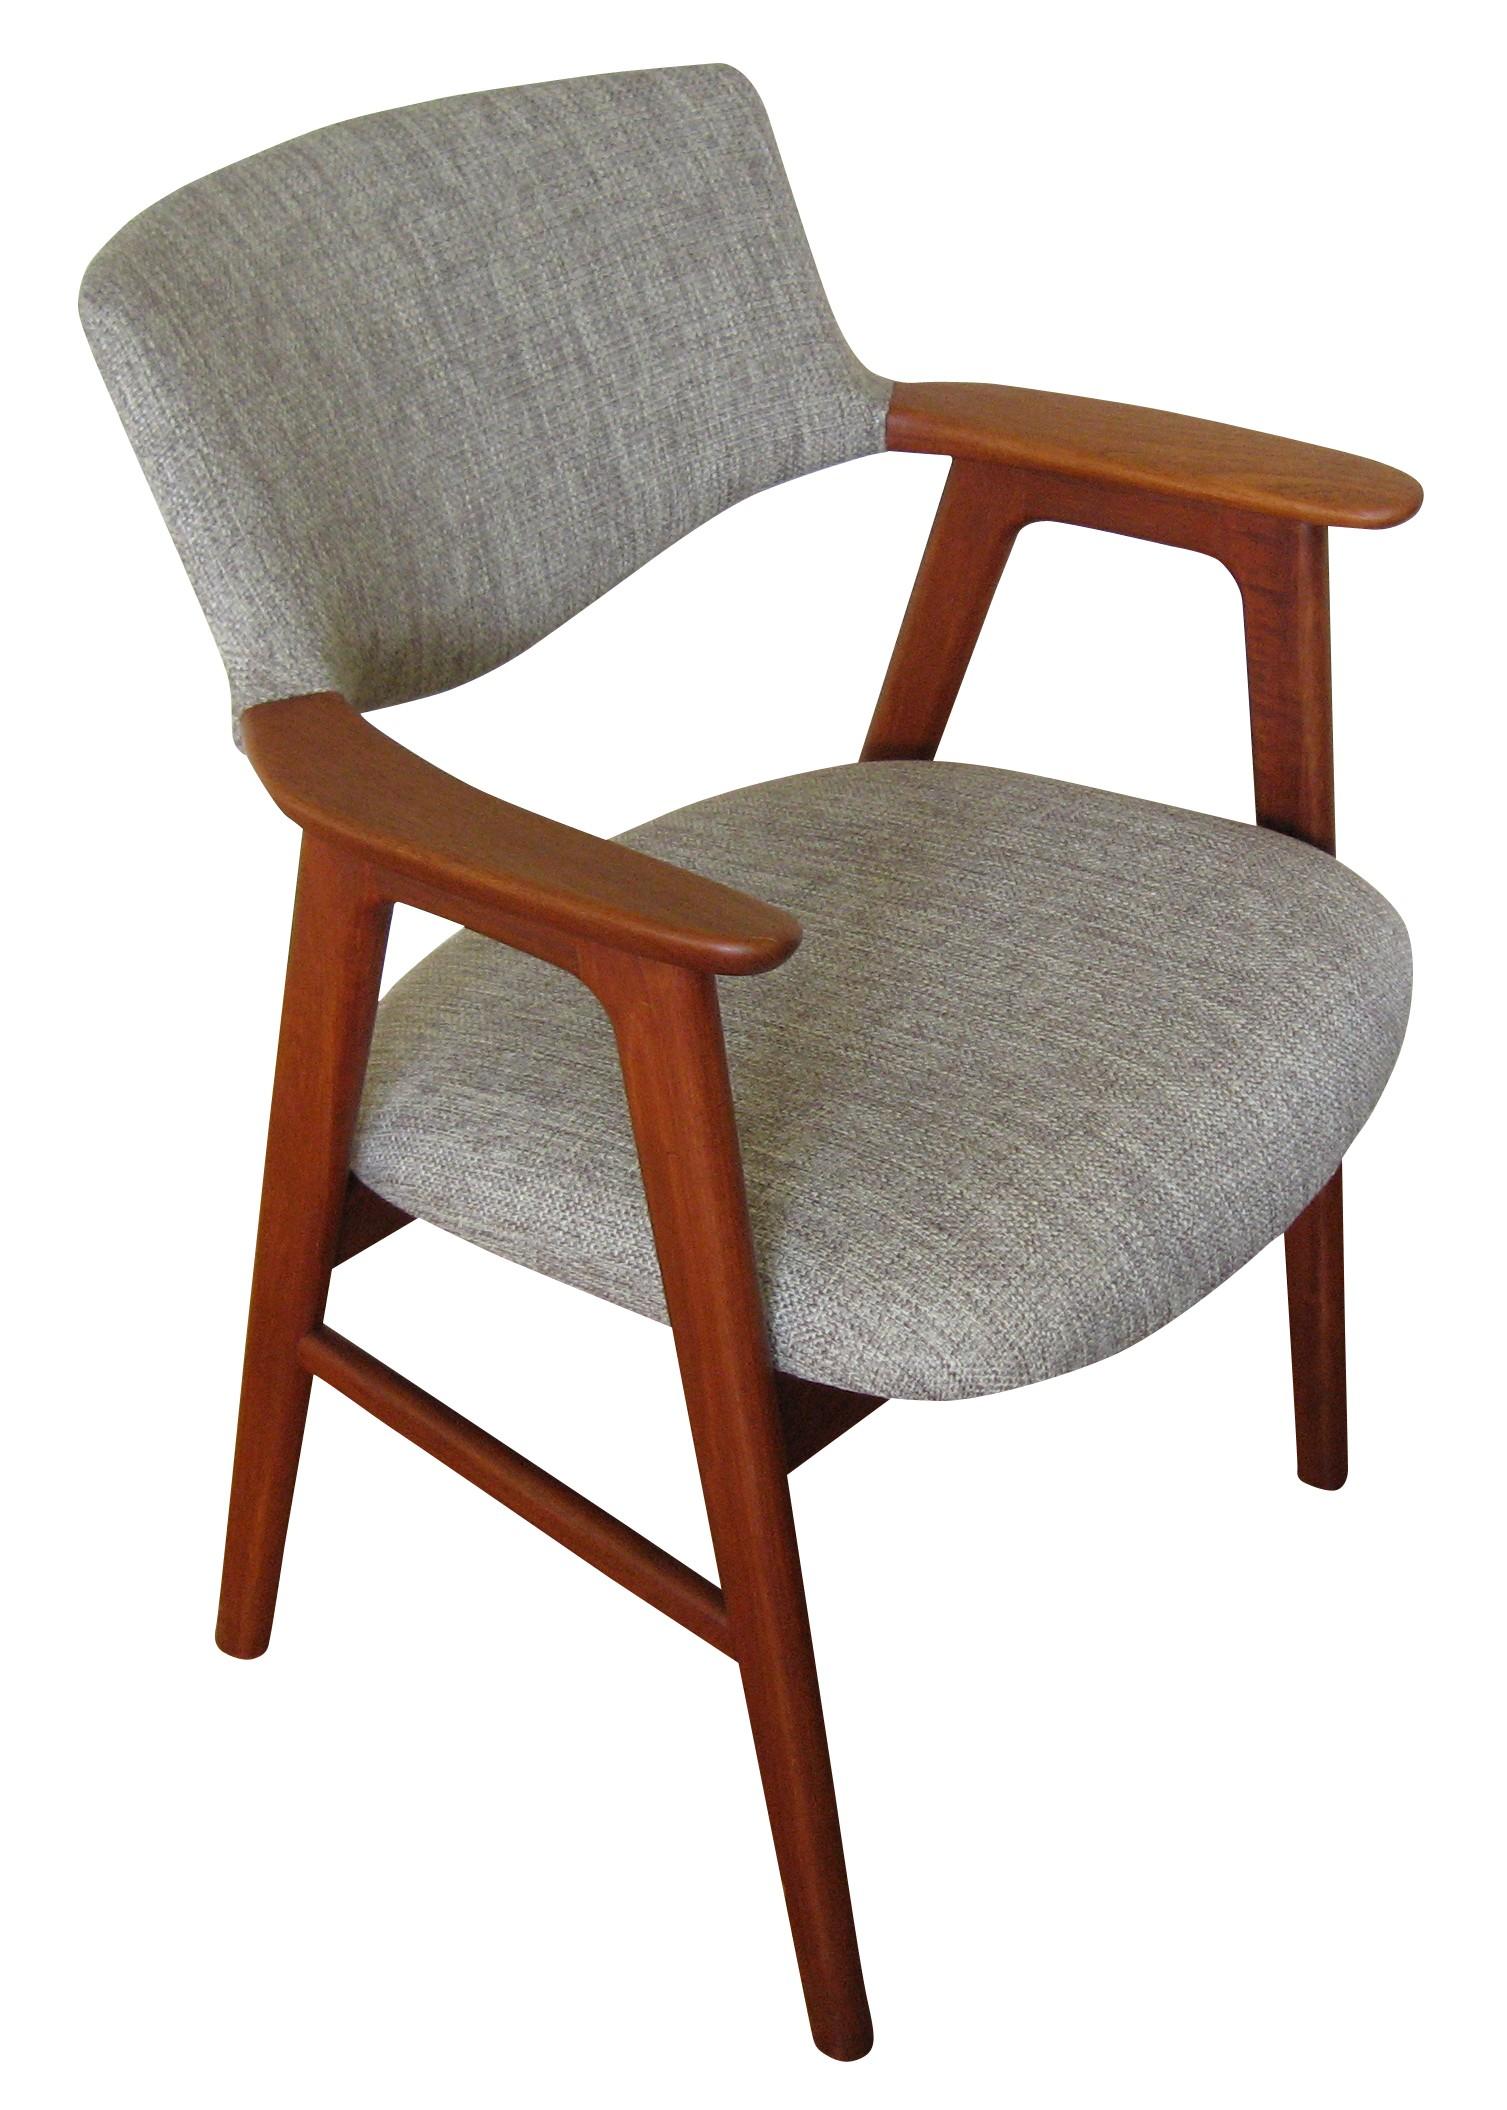 Danish teak armchair, Erik KIRKEGAARD - 1960s - Design Market